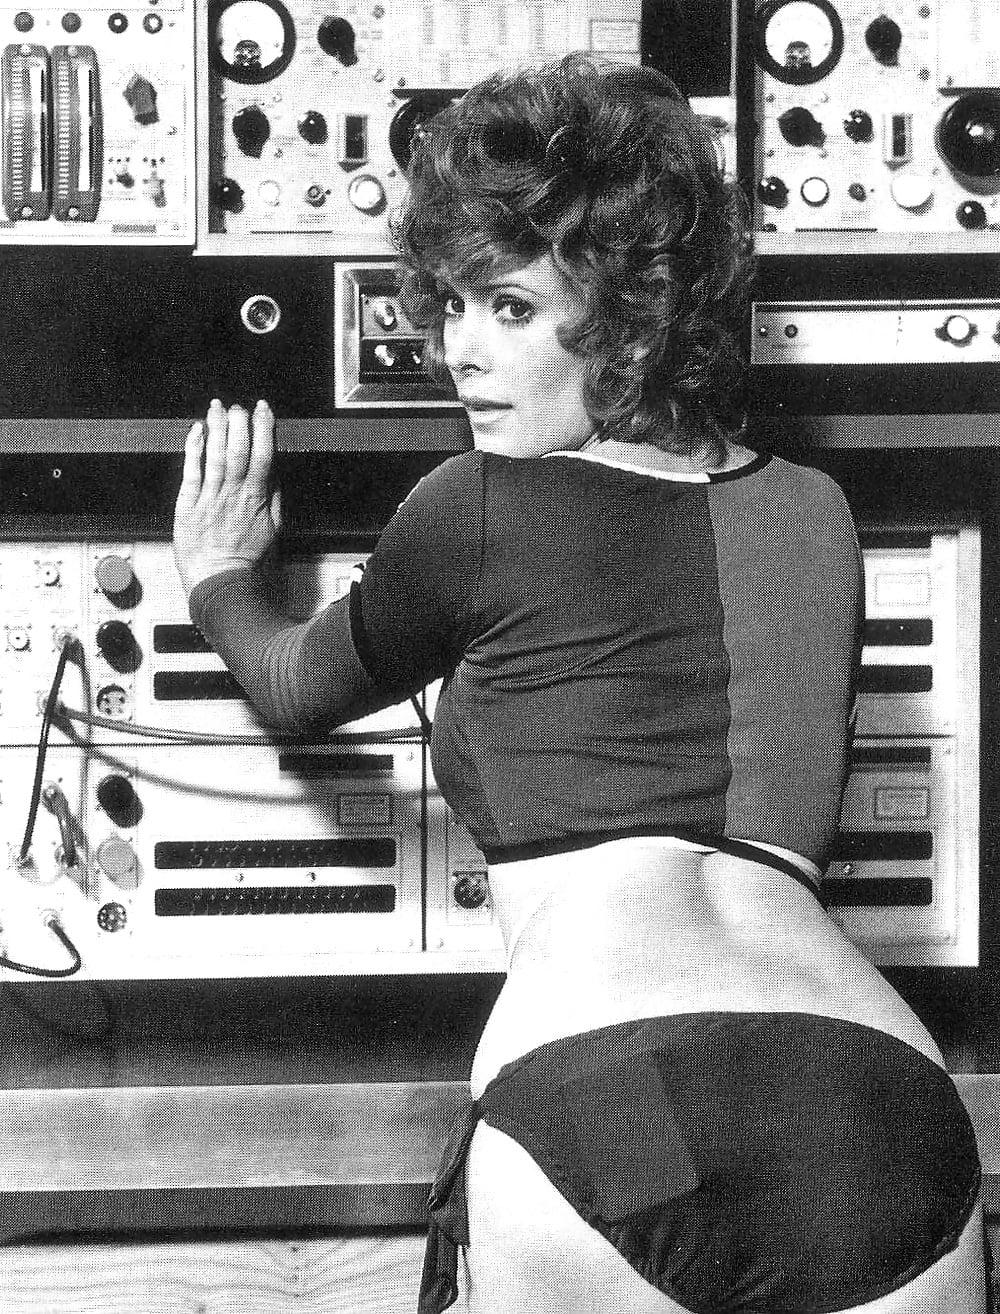 Womens desires bizarre 1984 us vintage porn movie - 1 part 8